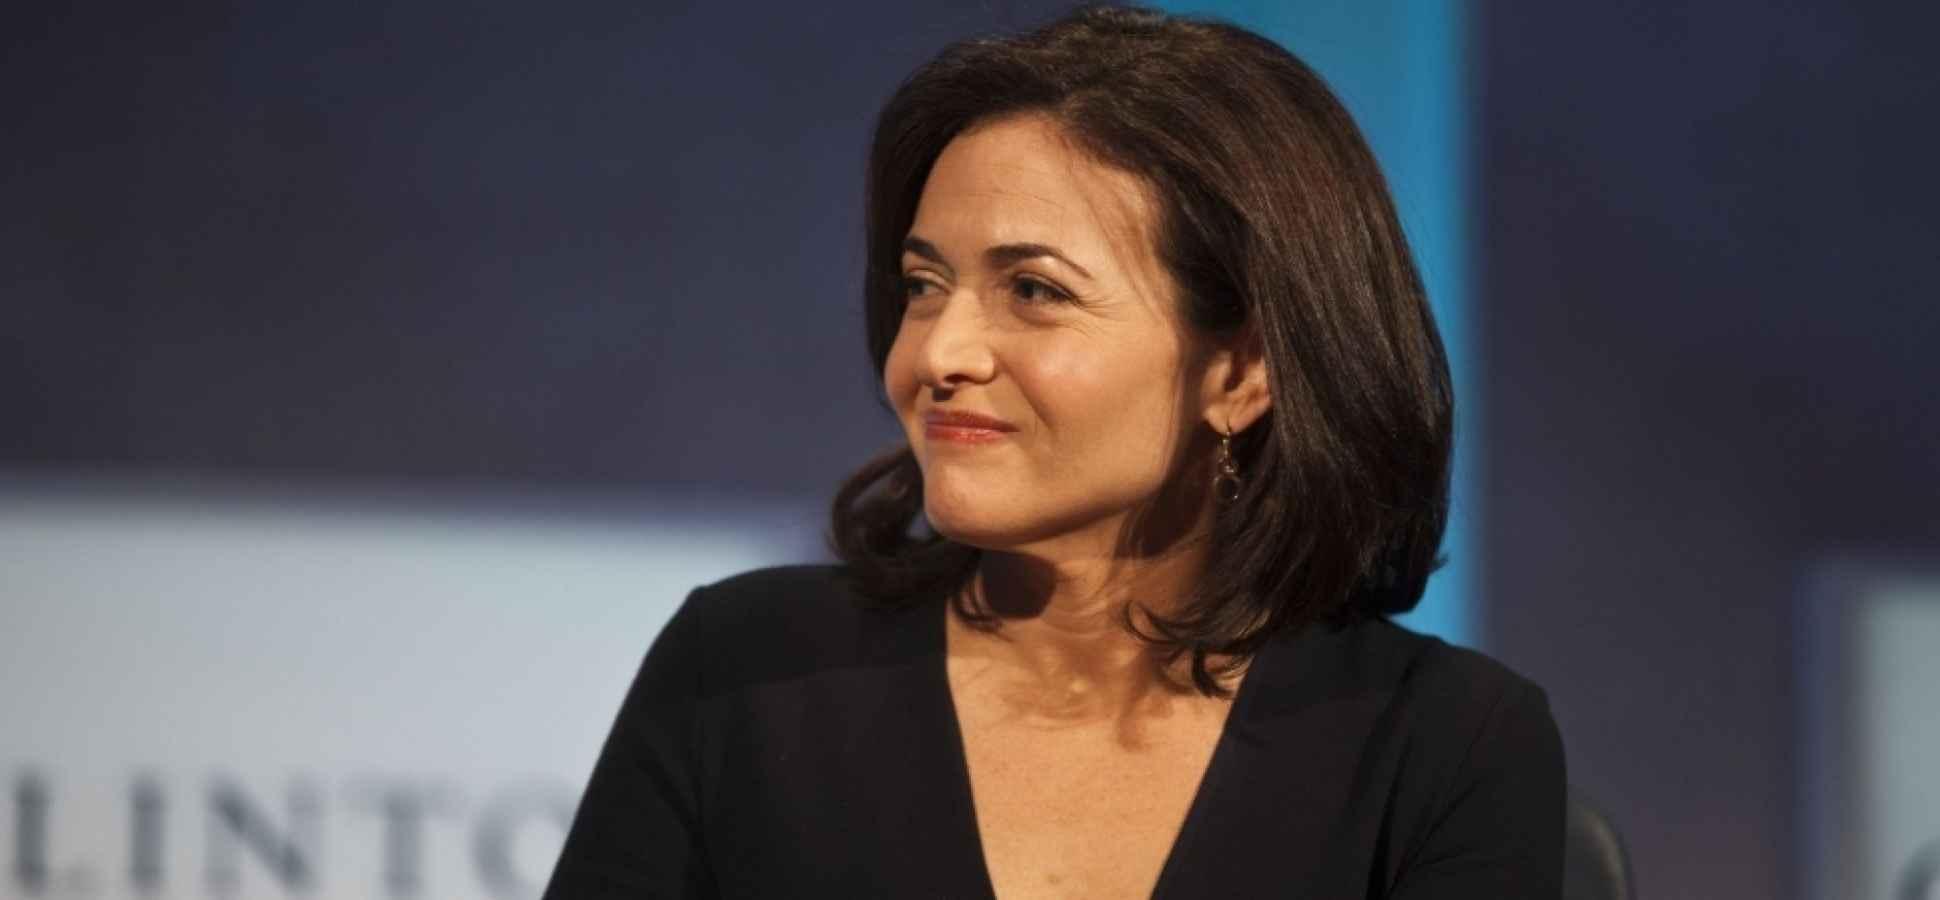 7 Powerful Books Sheryl Sandberg Wants Women to Read